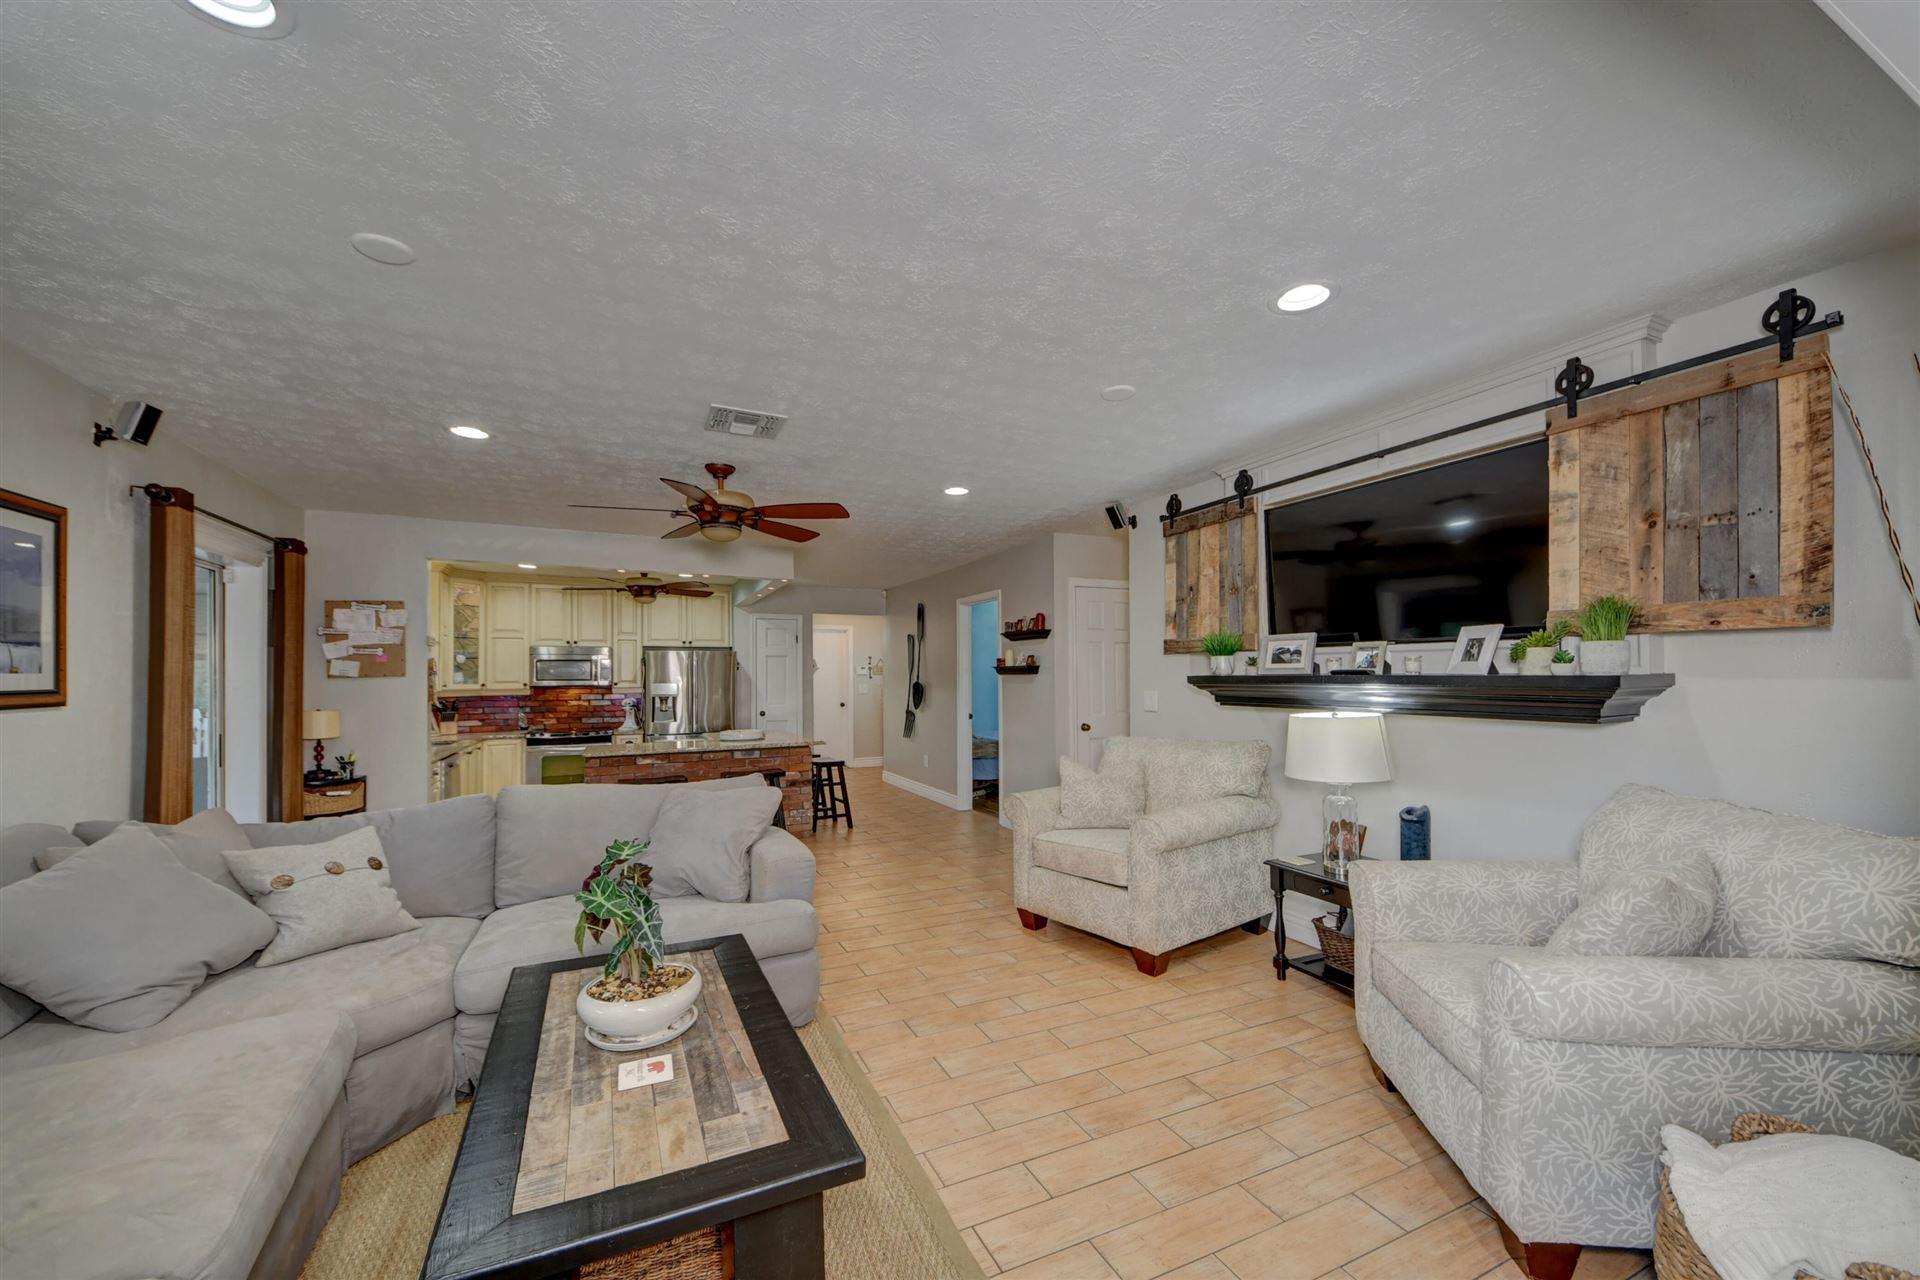 Photo of 2401 SE Sherlock Lane, Port Saint Lucie, FL 34952 (MLS # RX-10662021)